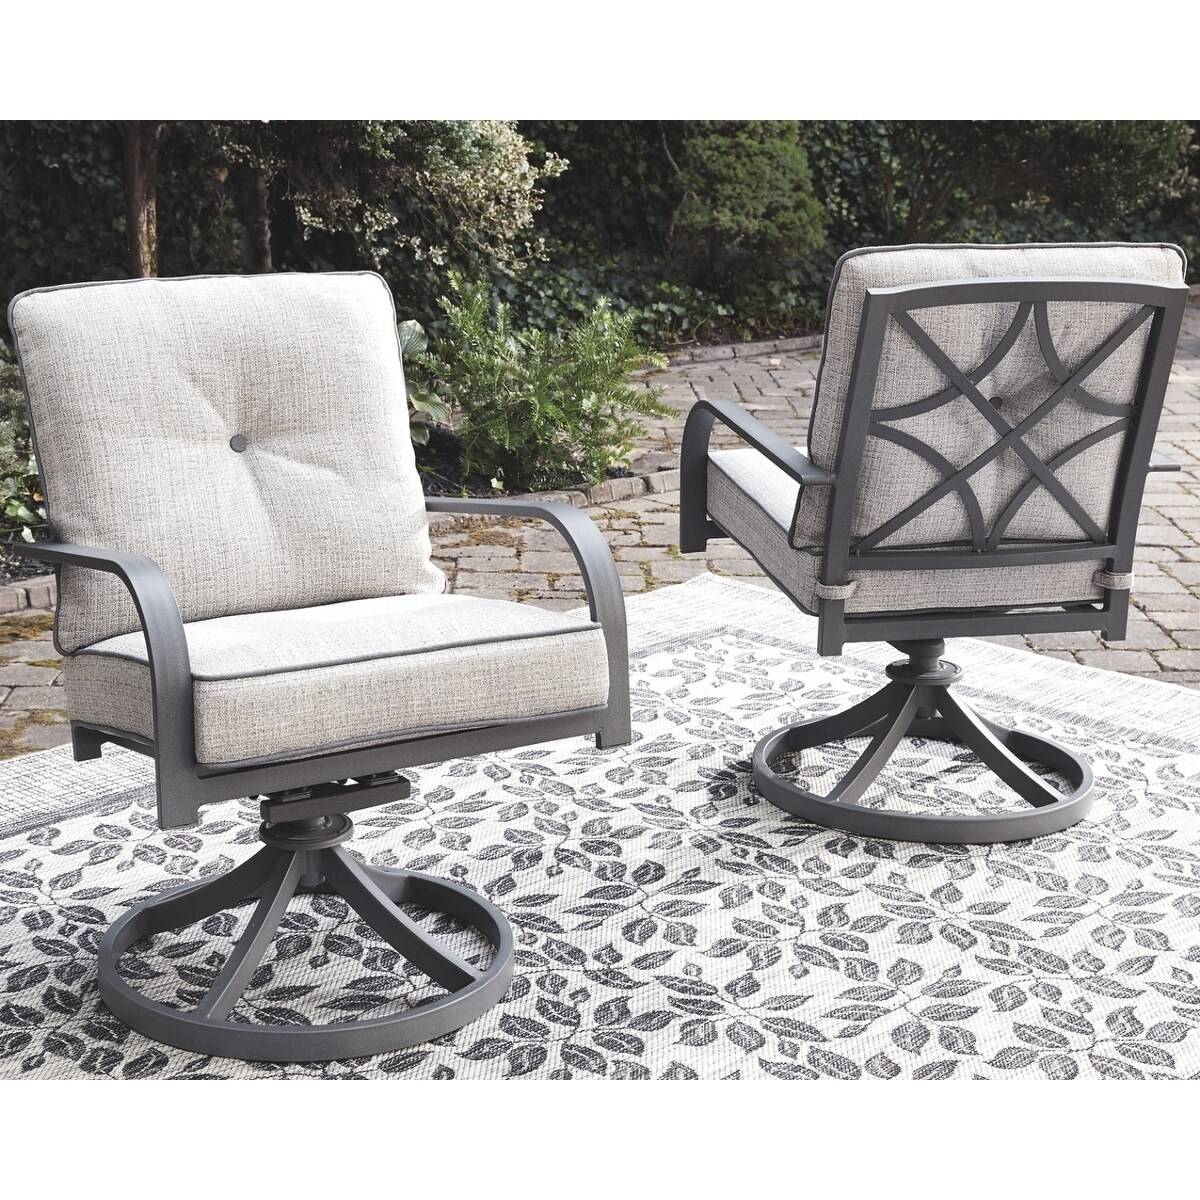 Donnalee Bay Outdoor Swivel Lounge Chair (Set Of 2)  Dark Gray